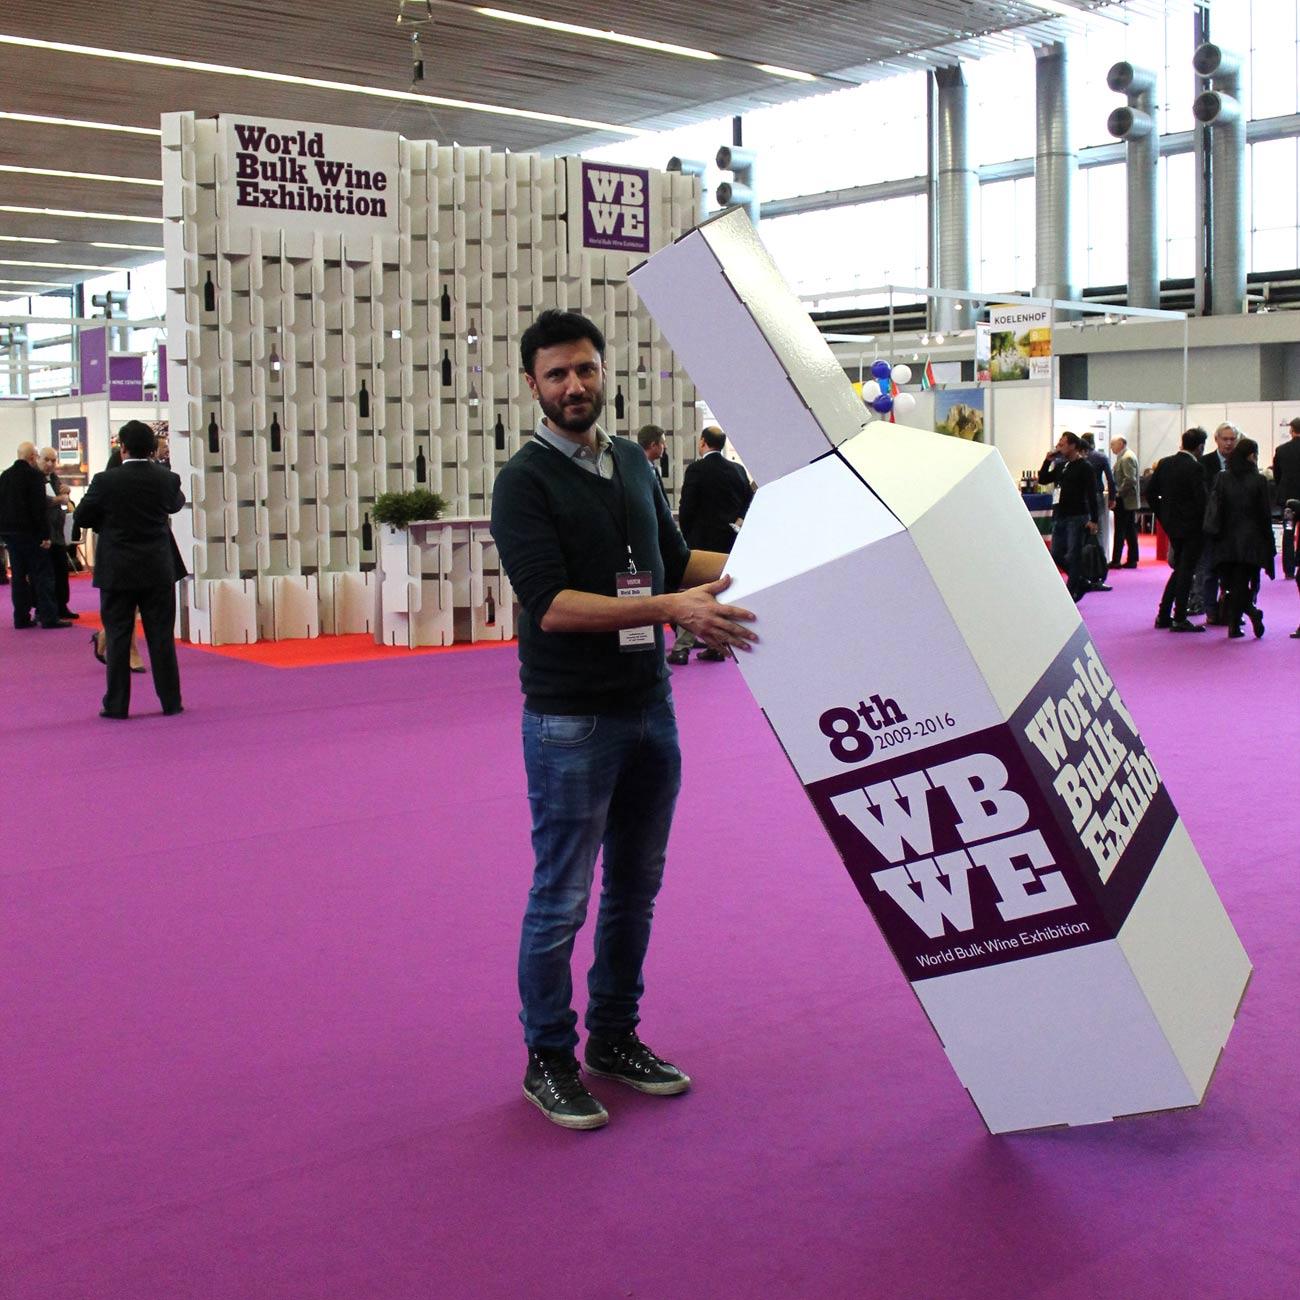 stand para feria de vino photocall botella vino world bulk wine exhibition